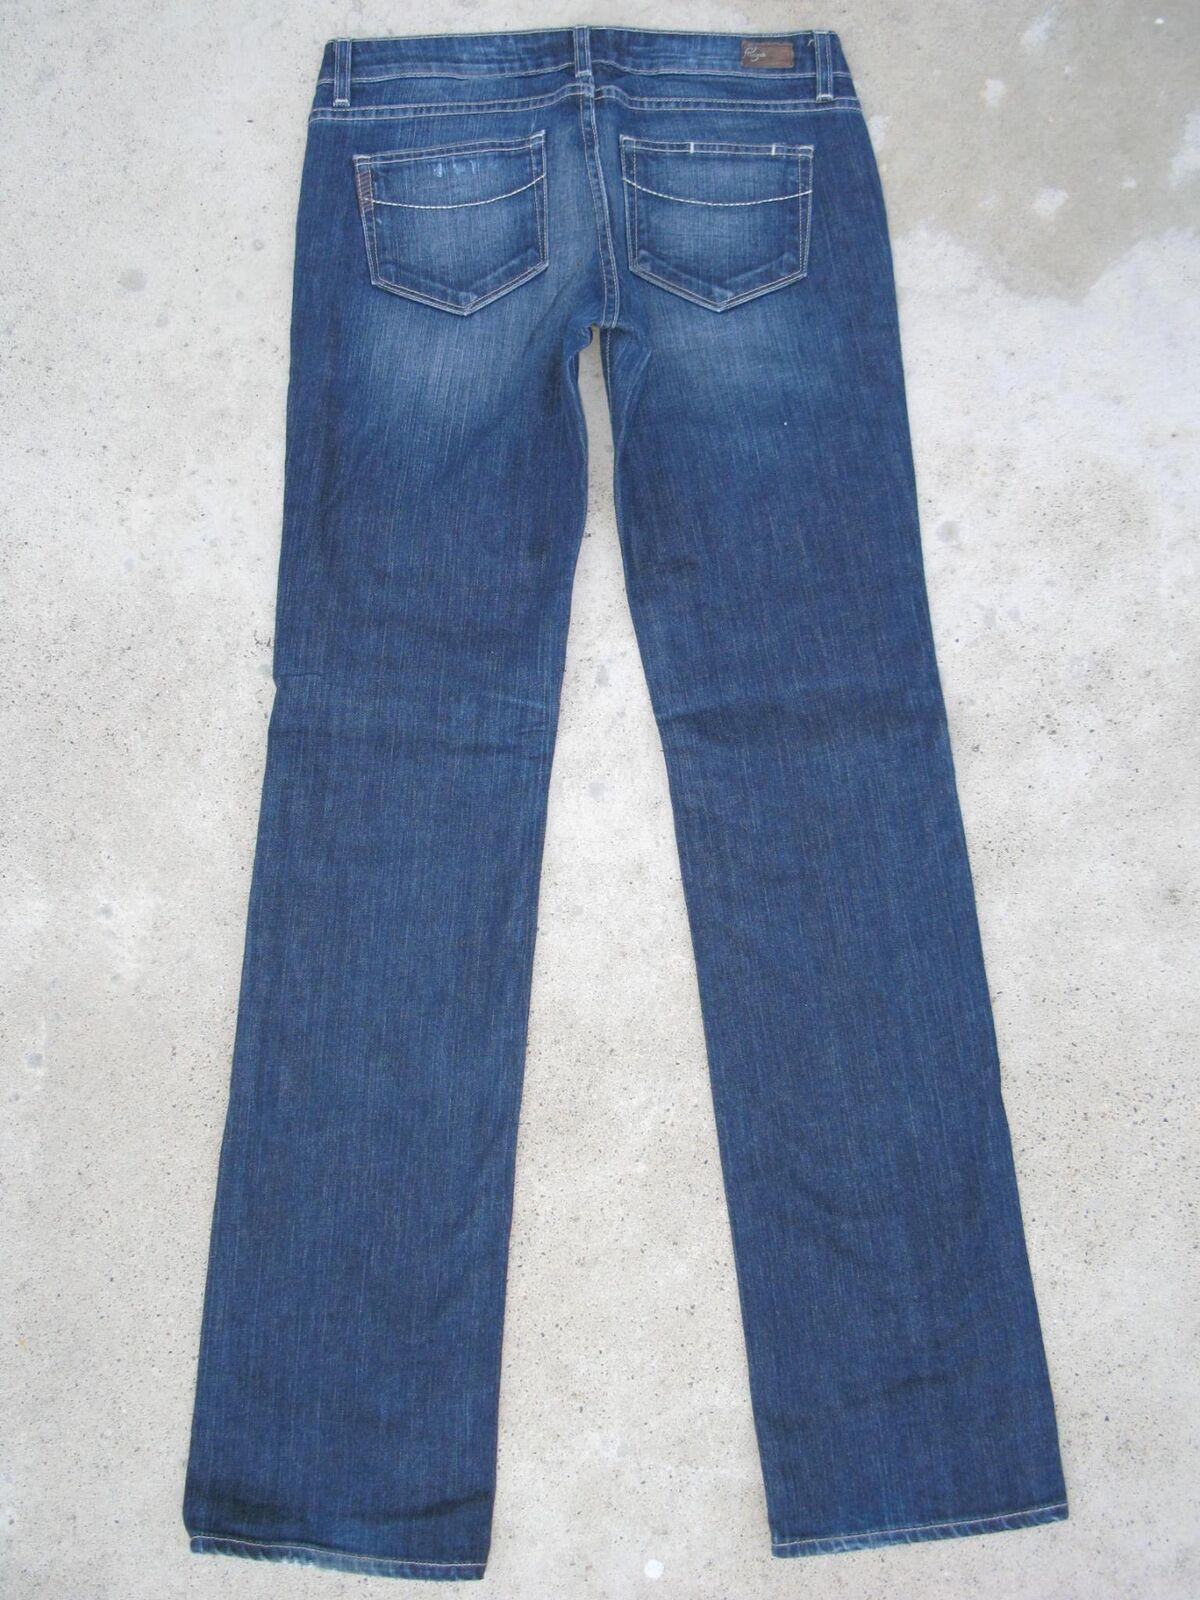 Paige Premium Jeans Womens Jimmy Jimmy Sz 26 Boyfriend Straight Distressed NEW